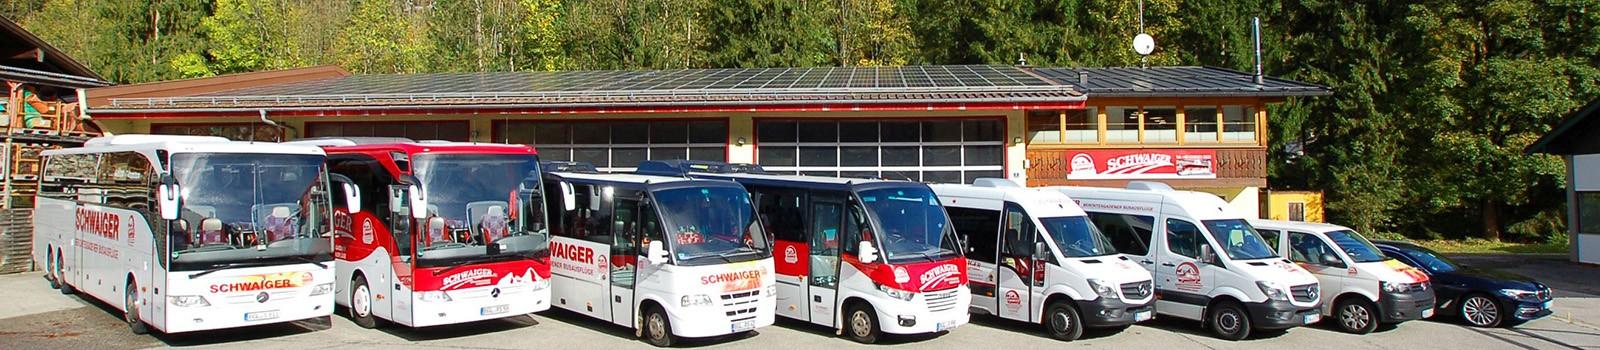 Fuhrpark Bus Schwaiger